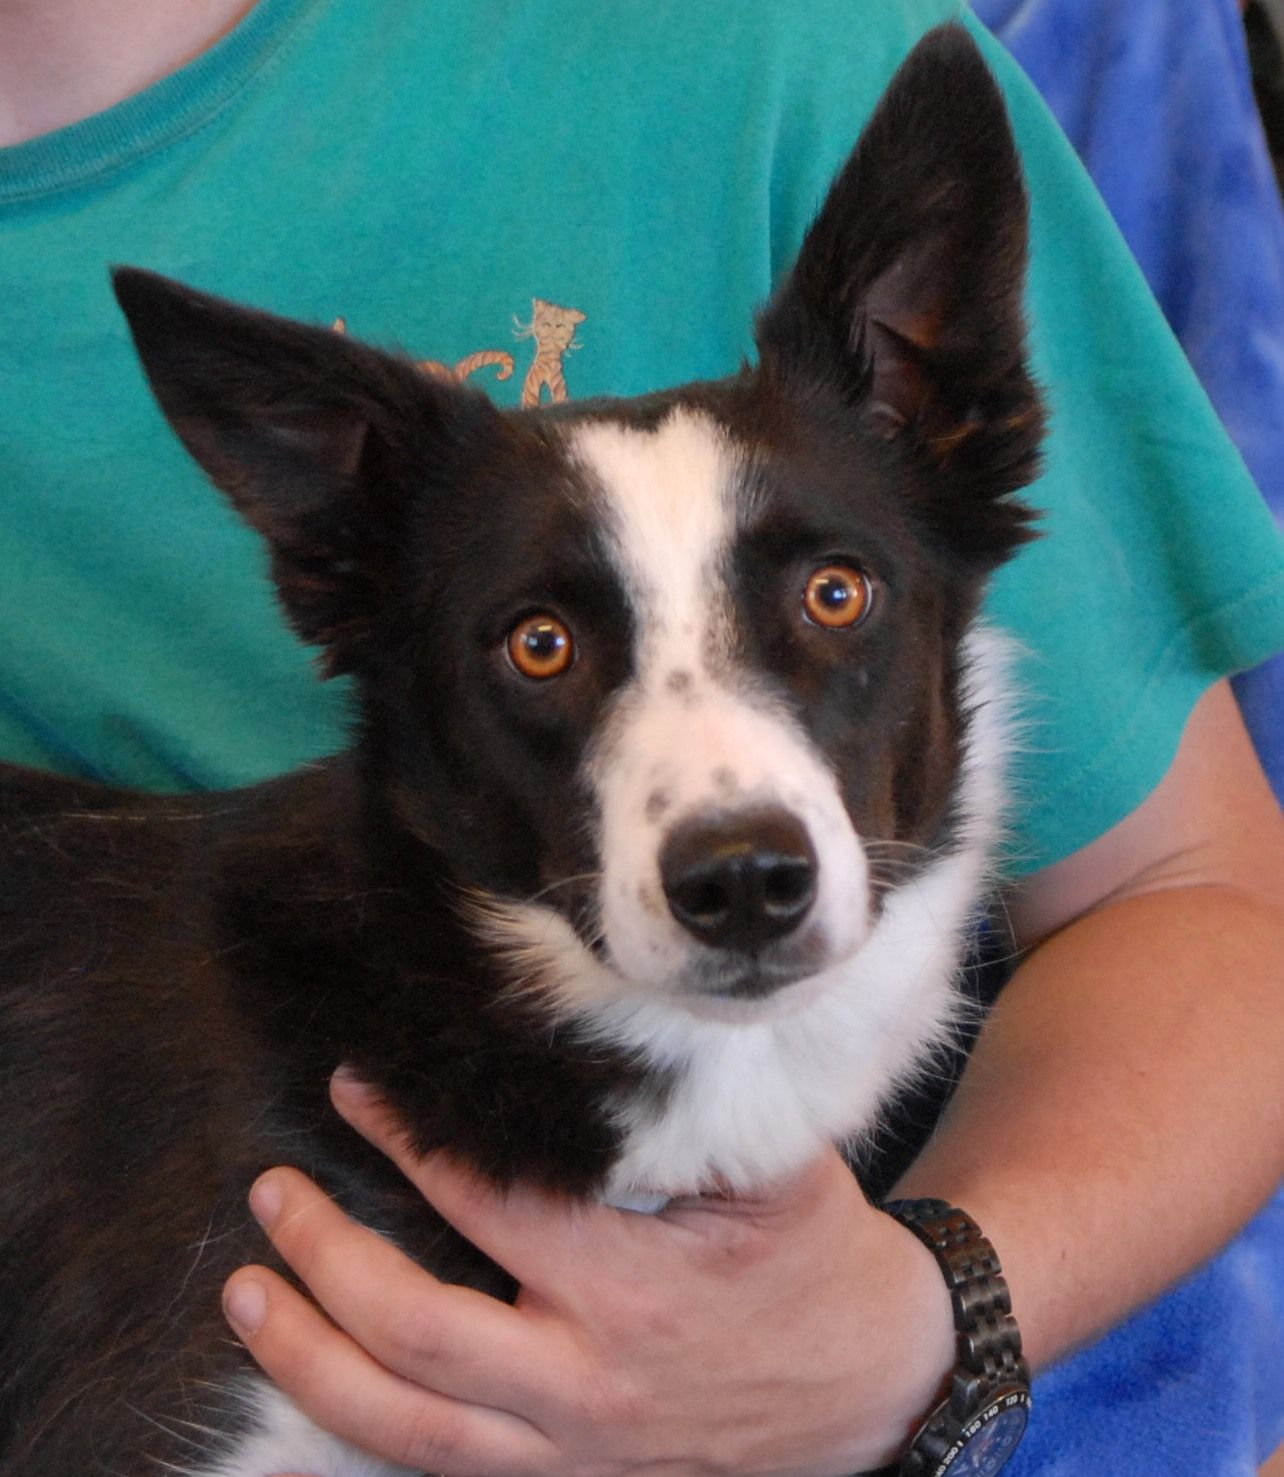 Border Collie dog for Adoption in Valrico, FL. ADN736520